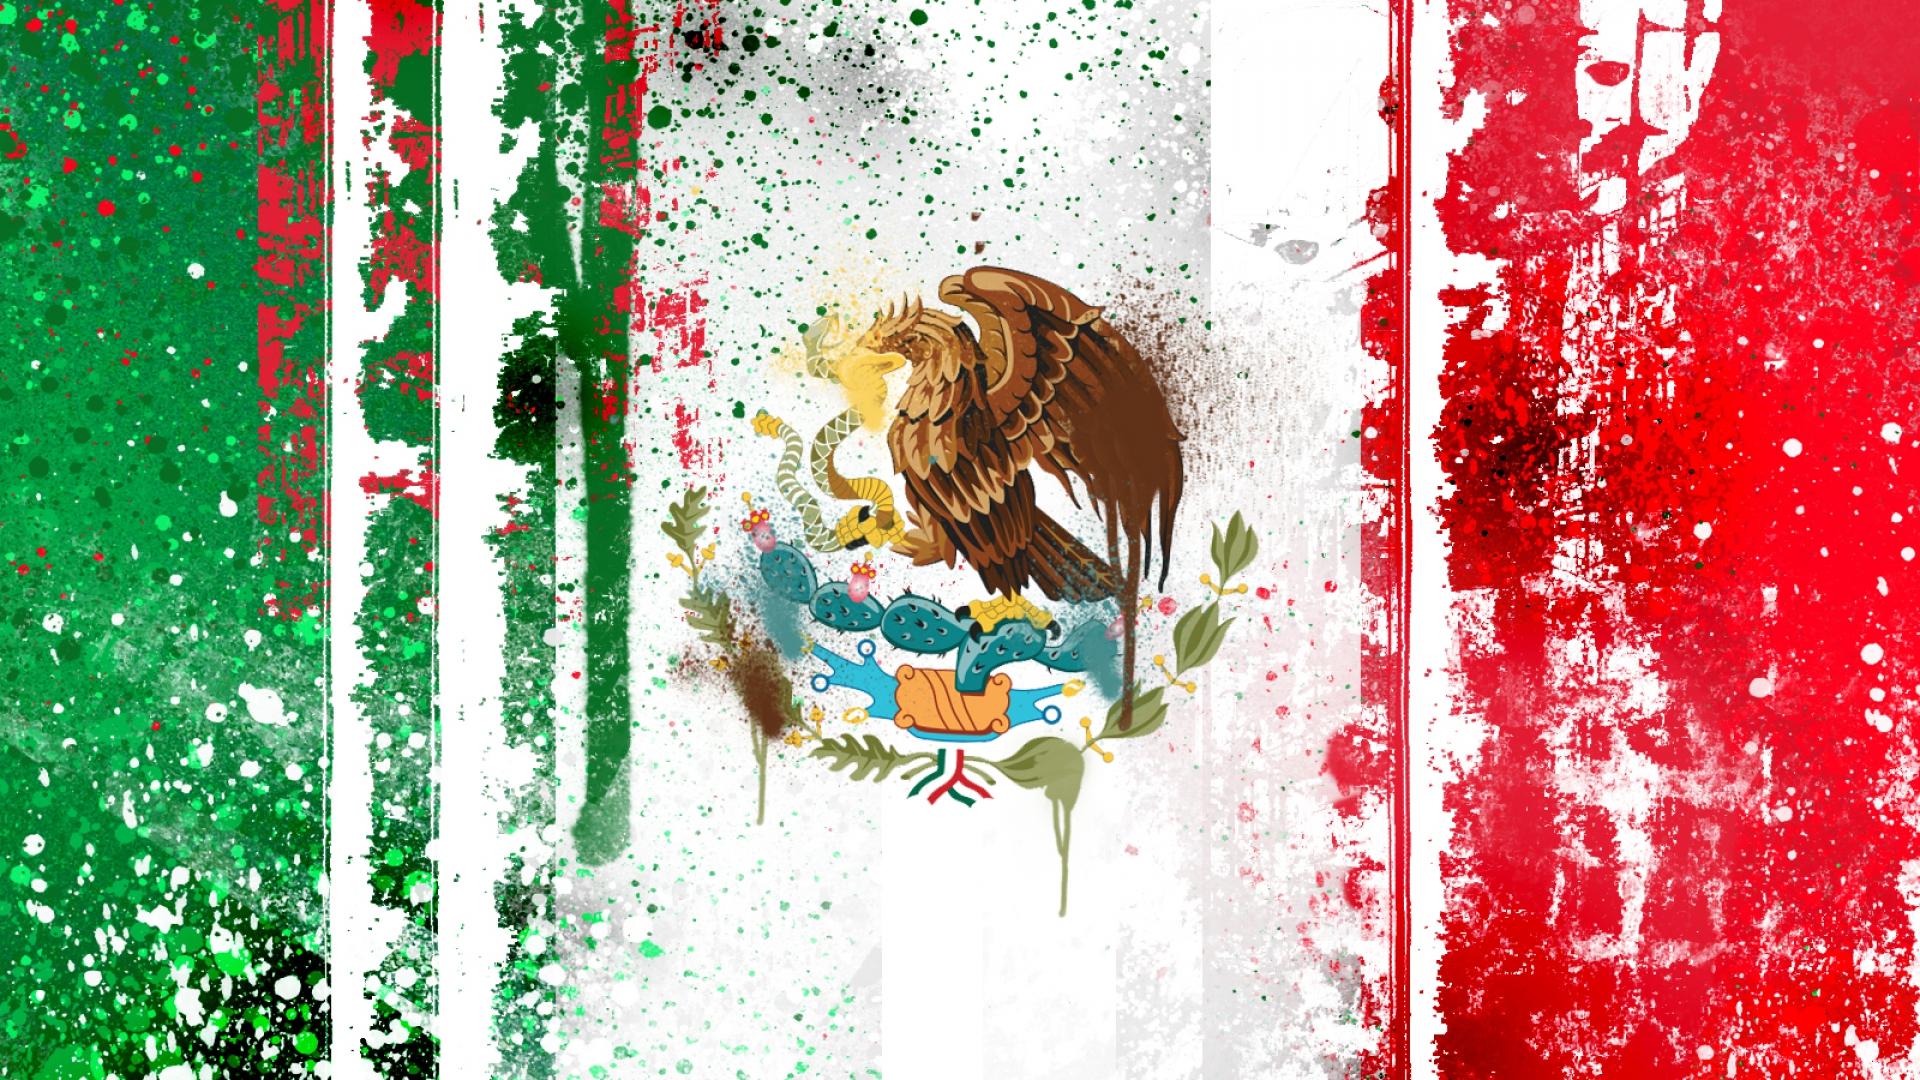 Mexico(imagination) - Hetalia Fan Characters Wiki